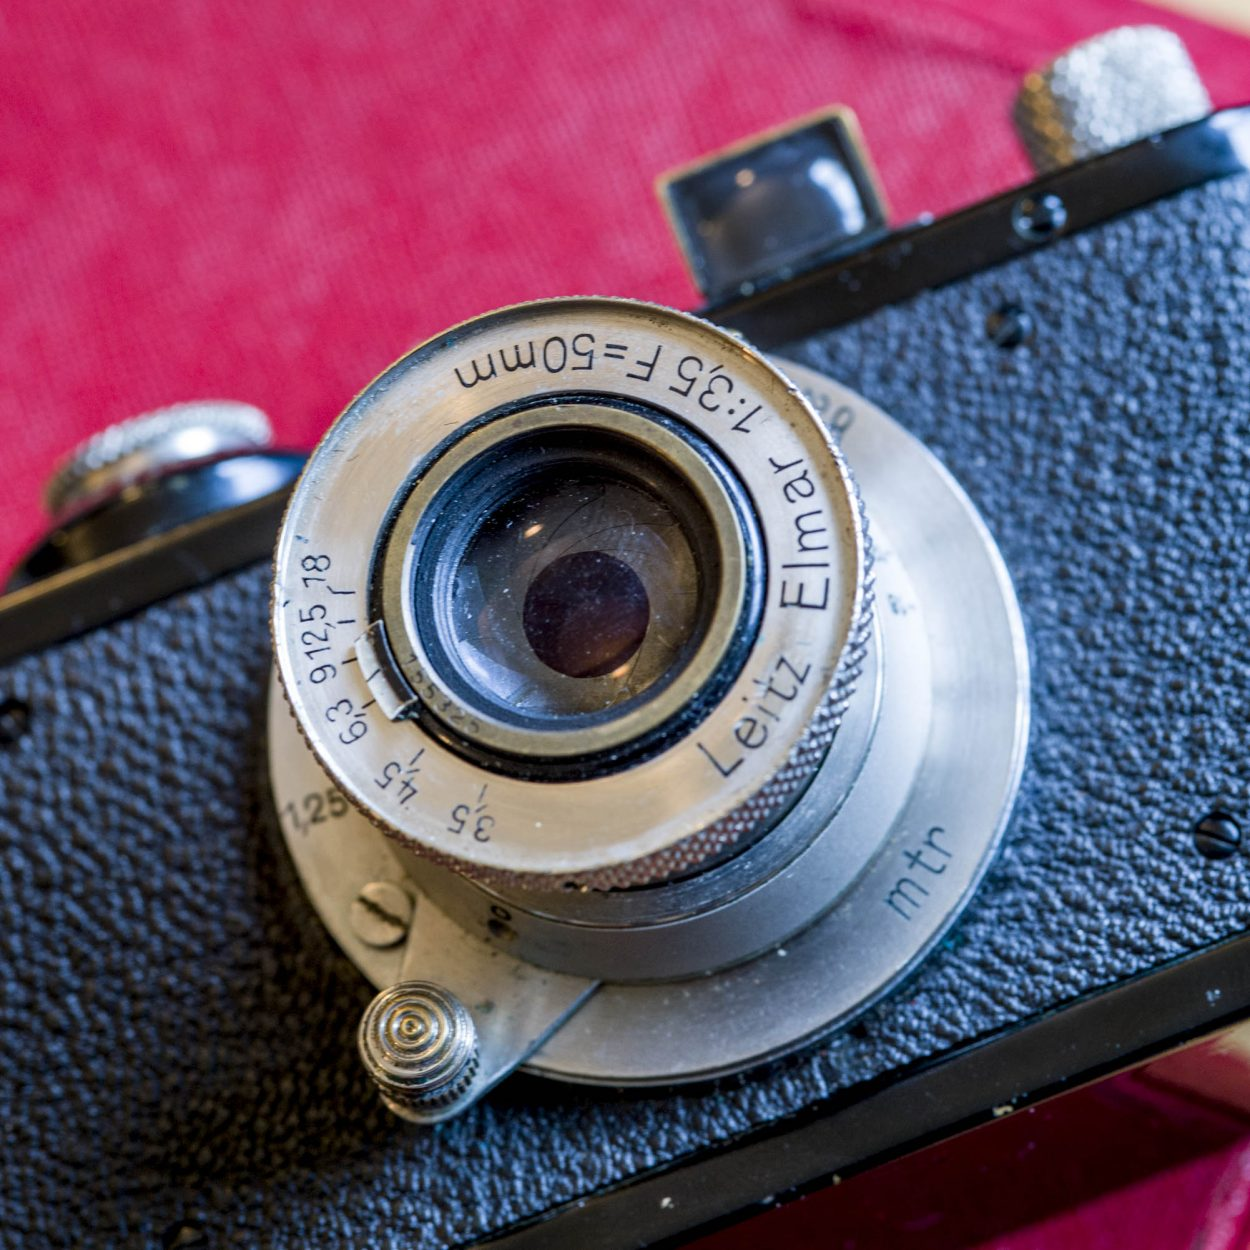 Elmar 50/2.5 lens (Pic: Darren Russell)